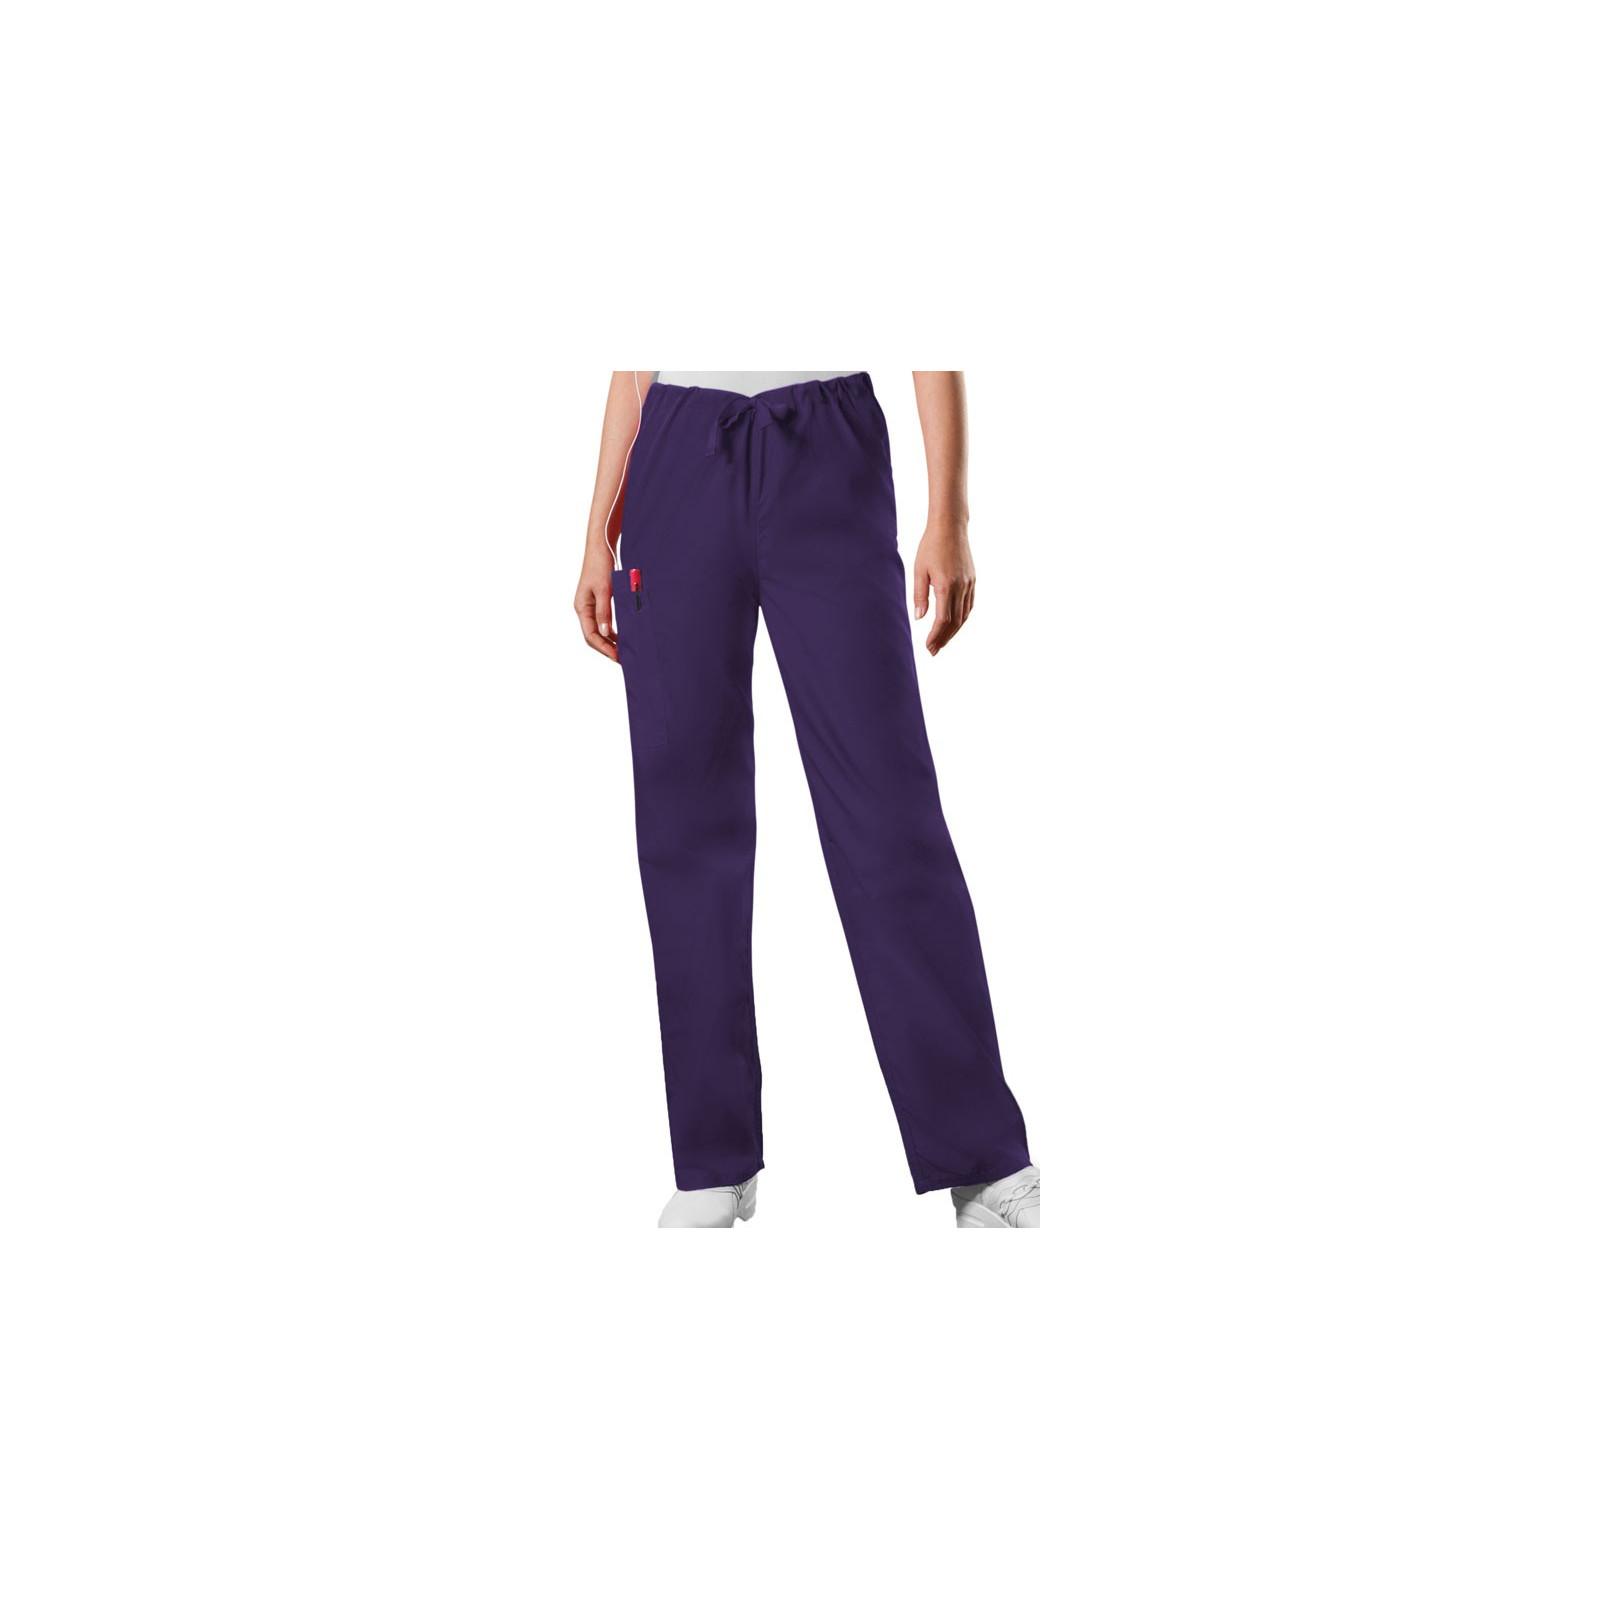 Pantalon UNISEXE à cordon ajustable Cherokee